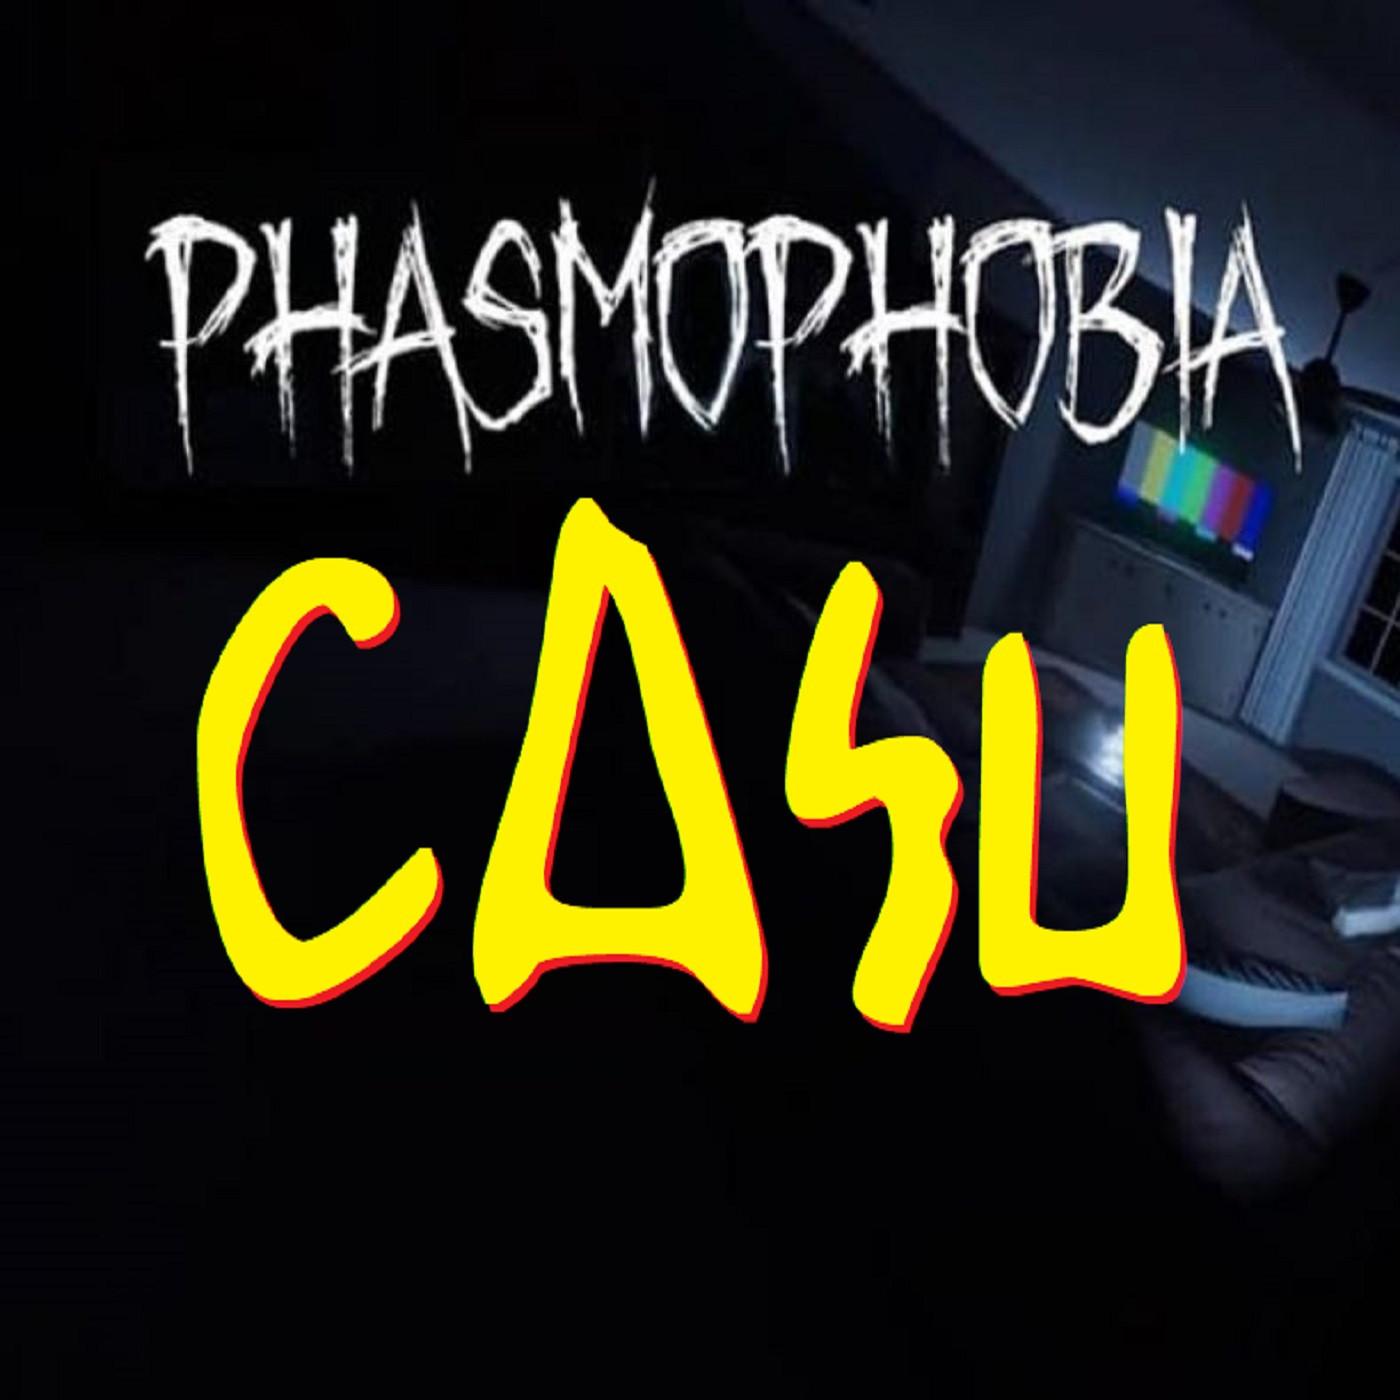 Phasmophobia (Ghostbusters: Un métier d'avenir ?)